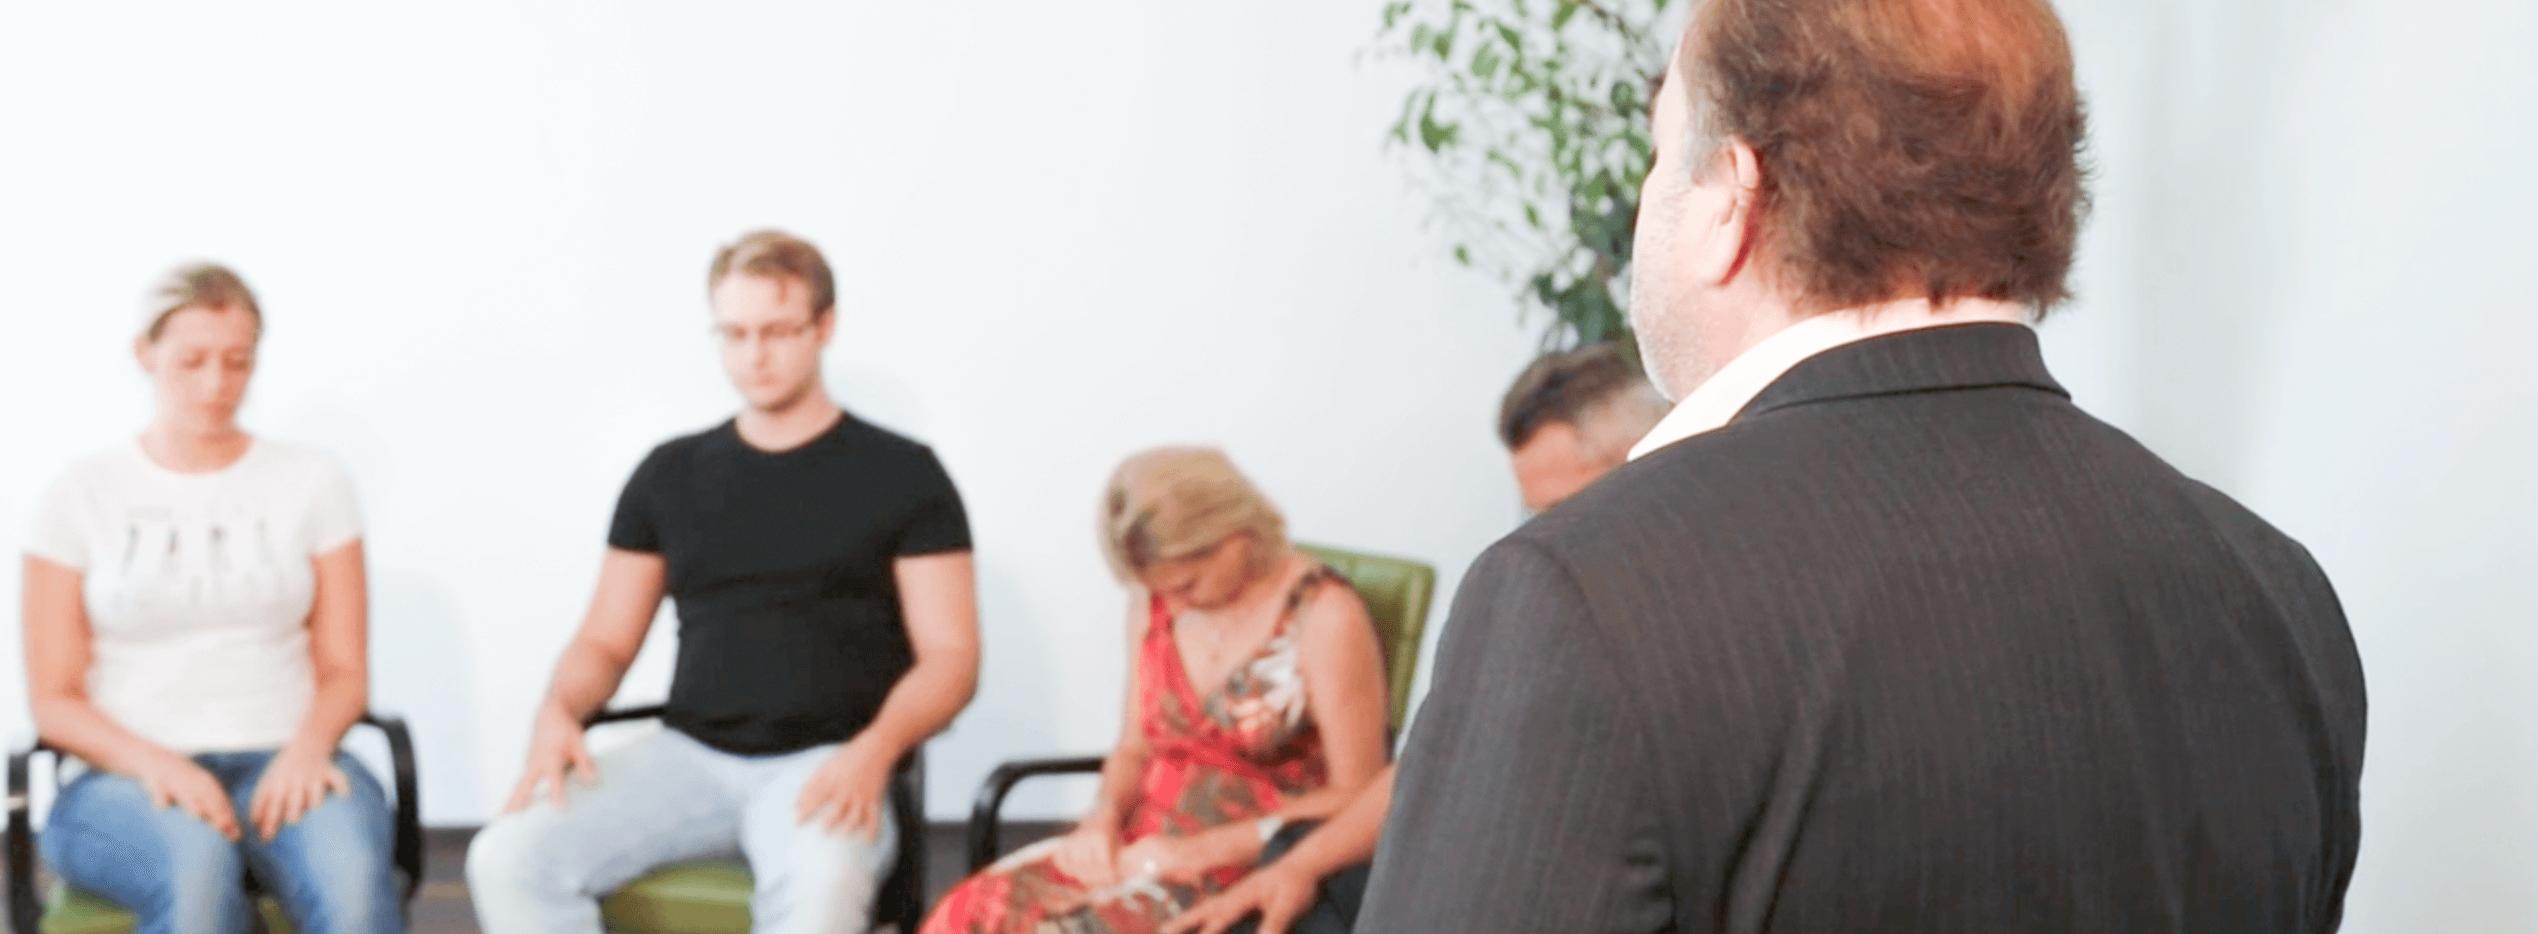 hypnoseinstitut-pissinger-kurs-sitzung1